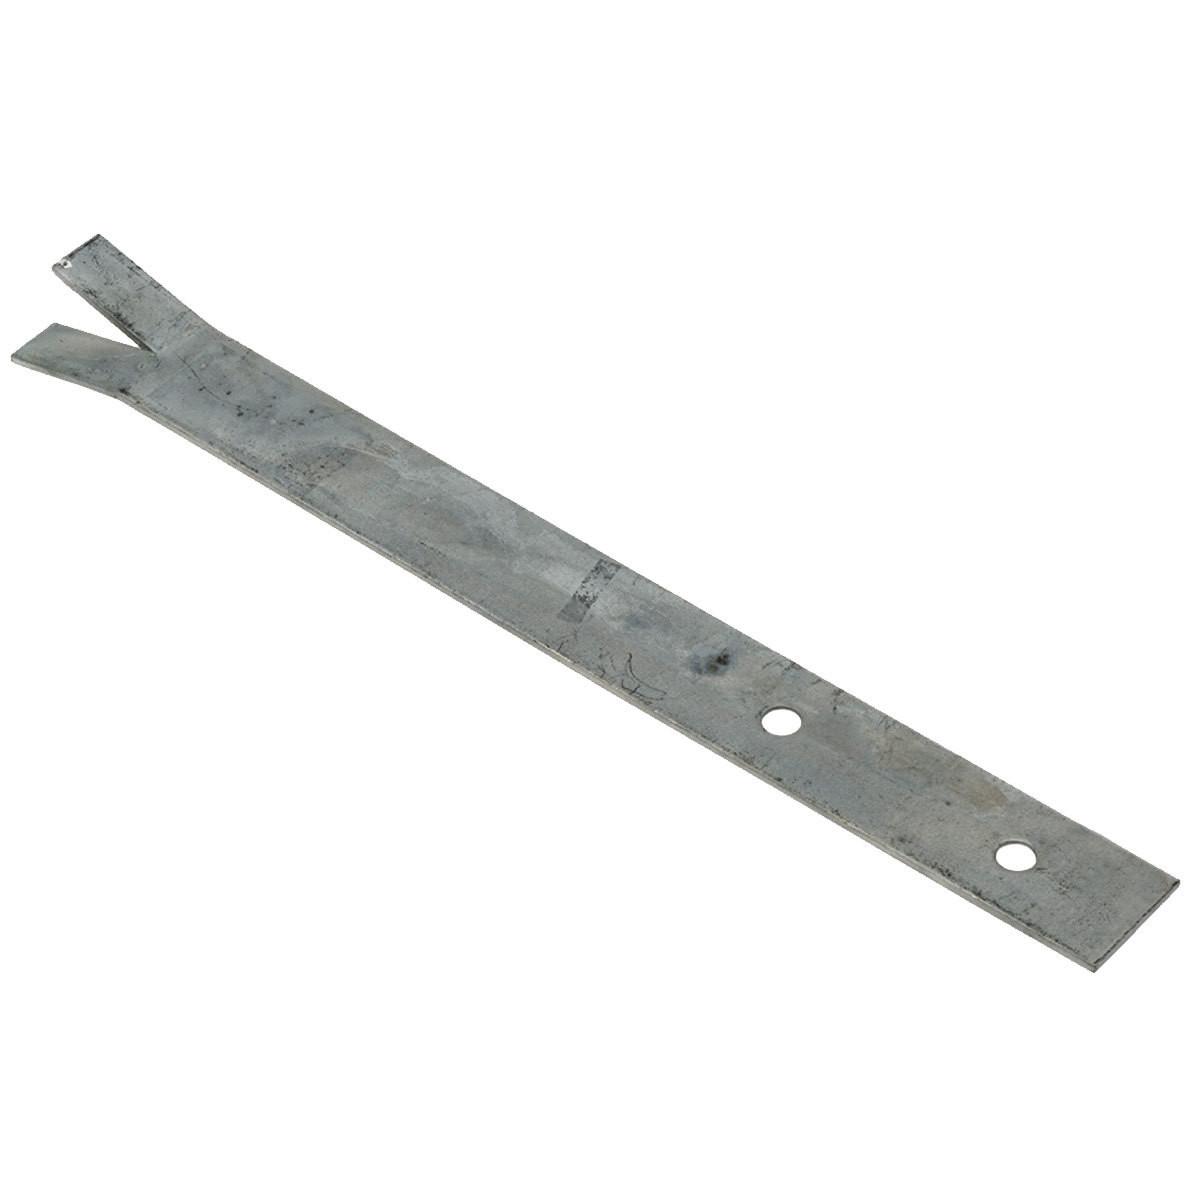 Плоский анкер для бетонирования Split KBT